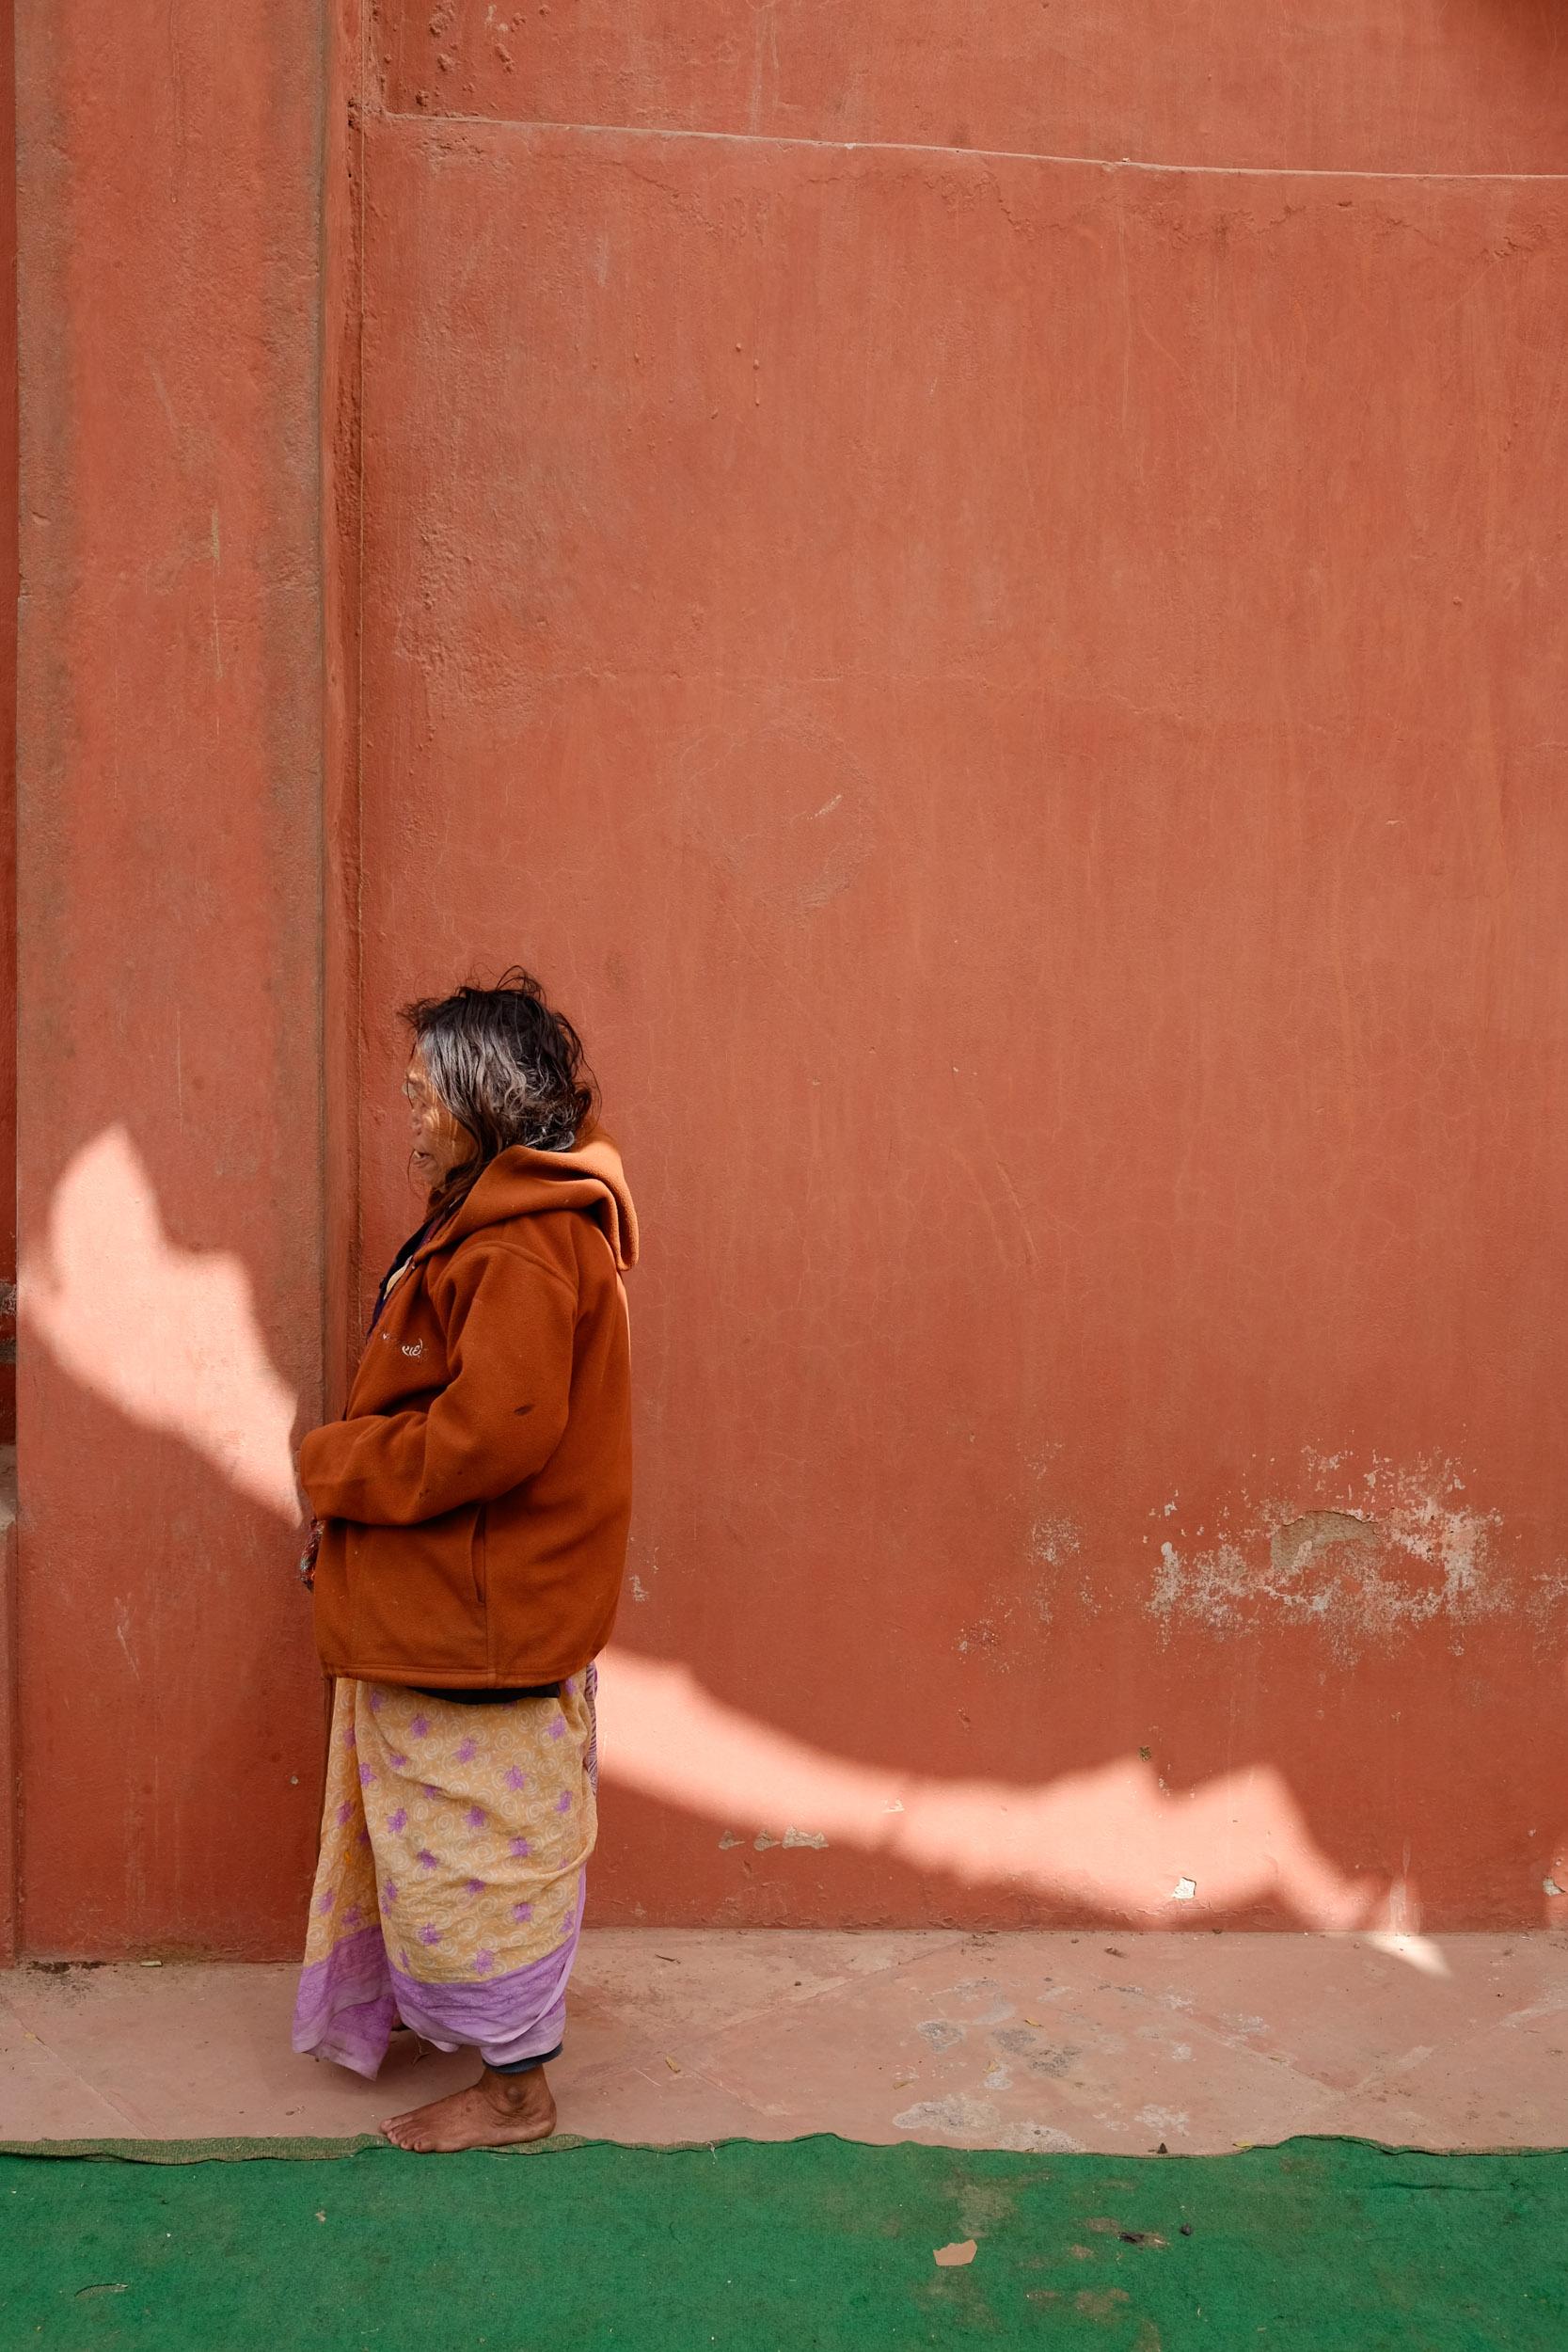 Sindhur_Photography_Travel_People_Holi-1.JPG